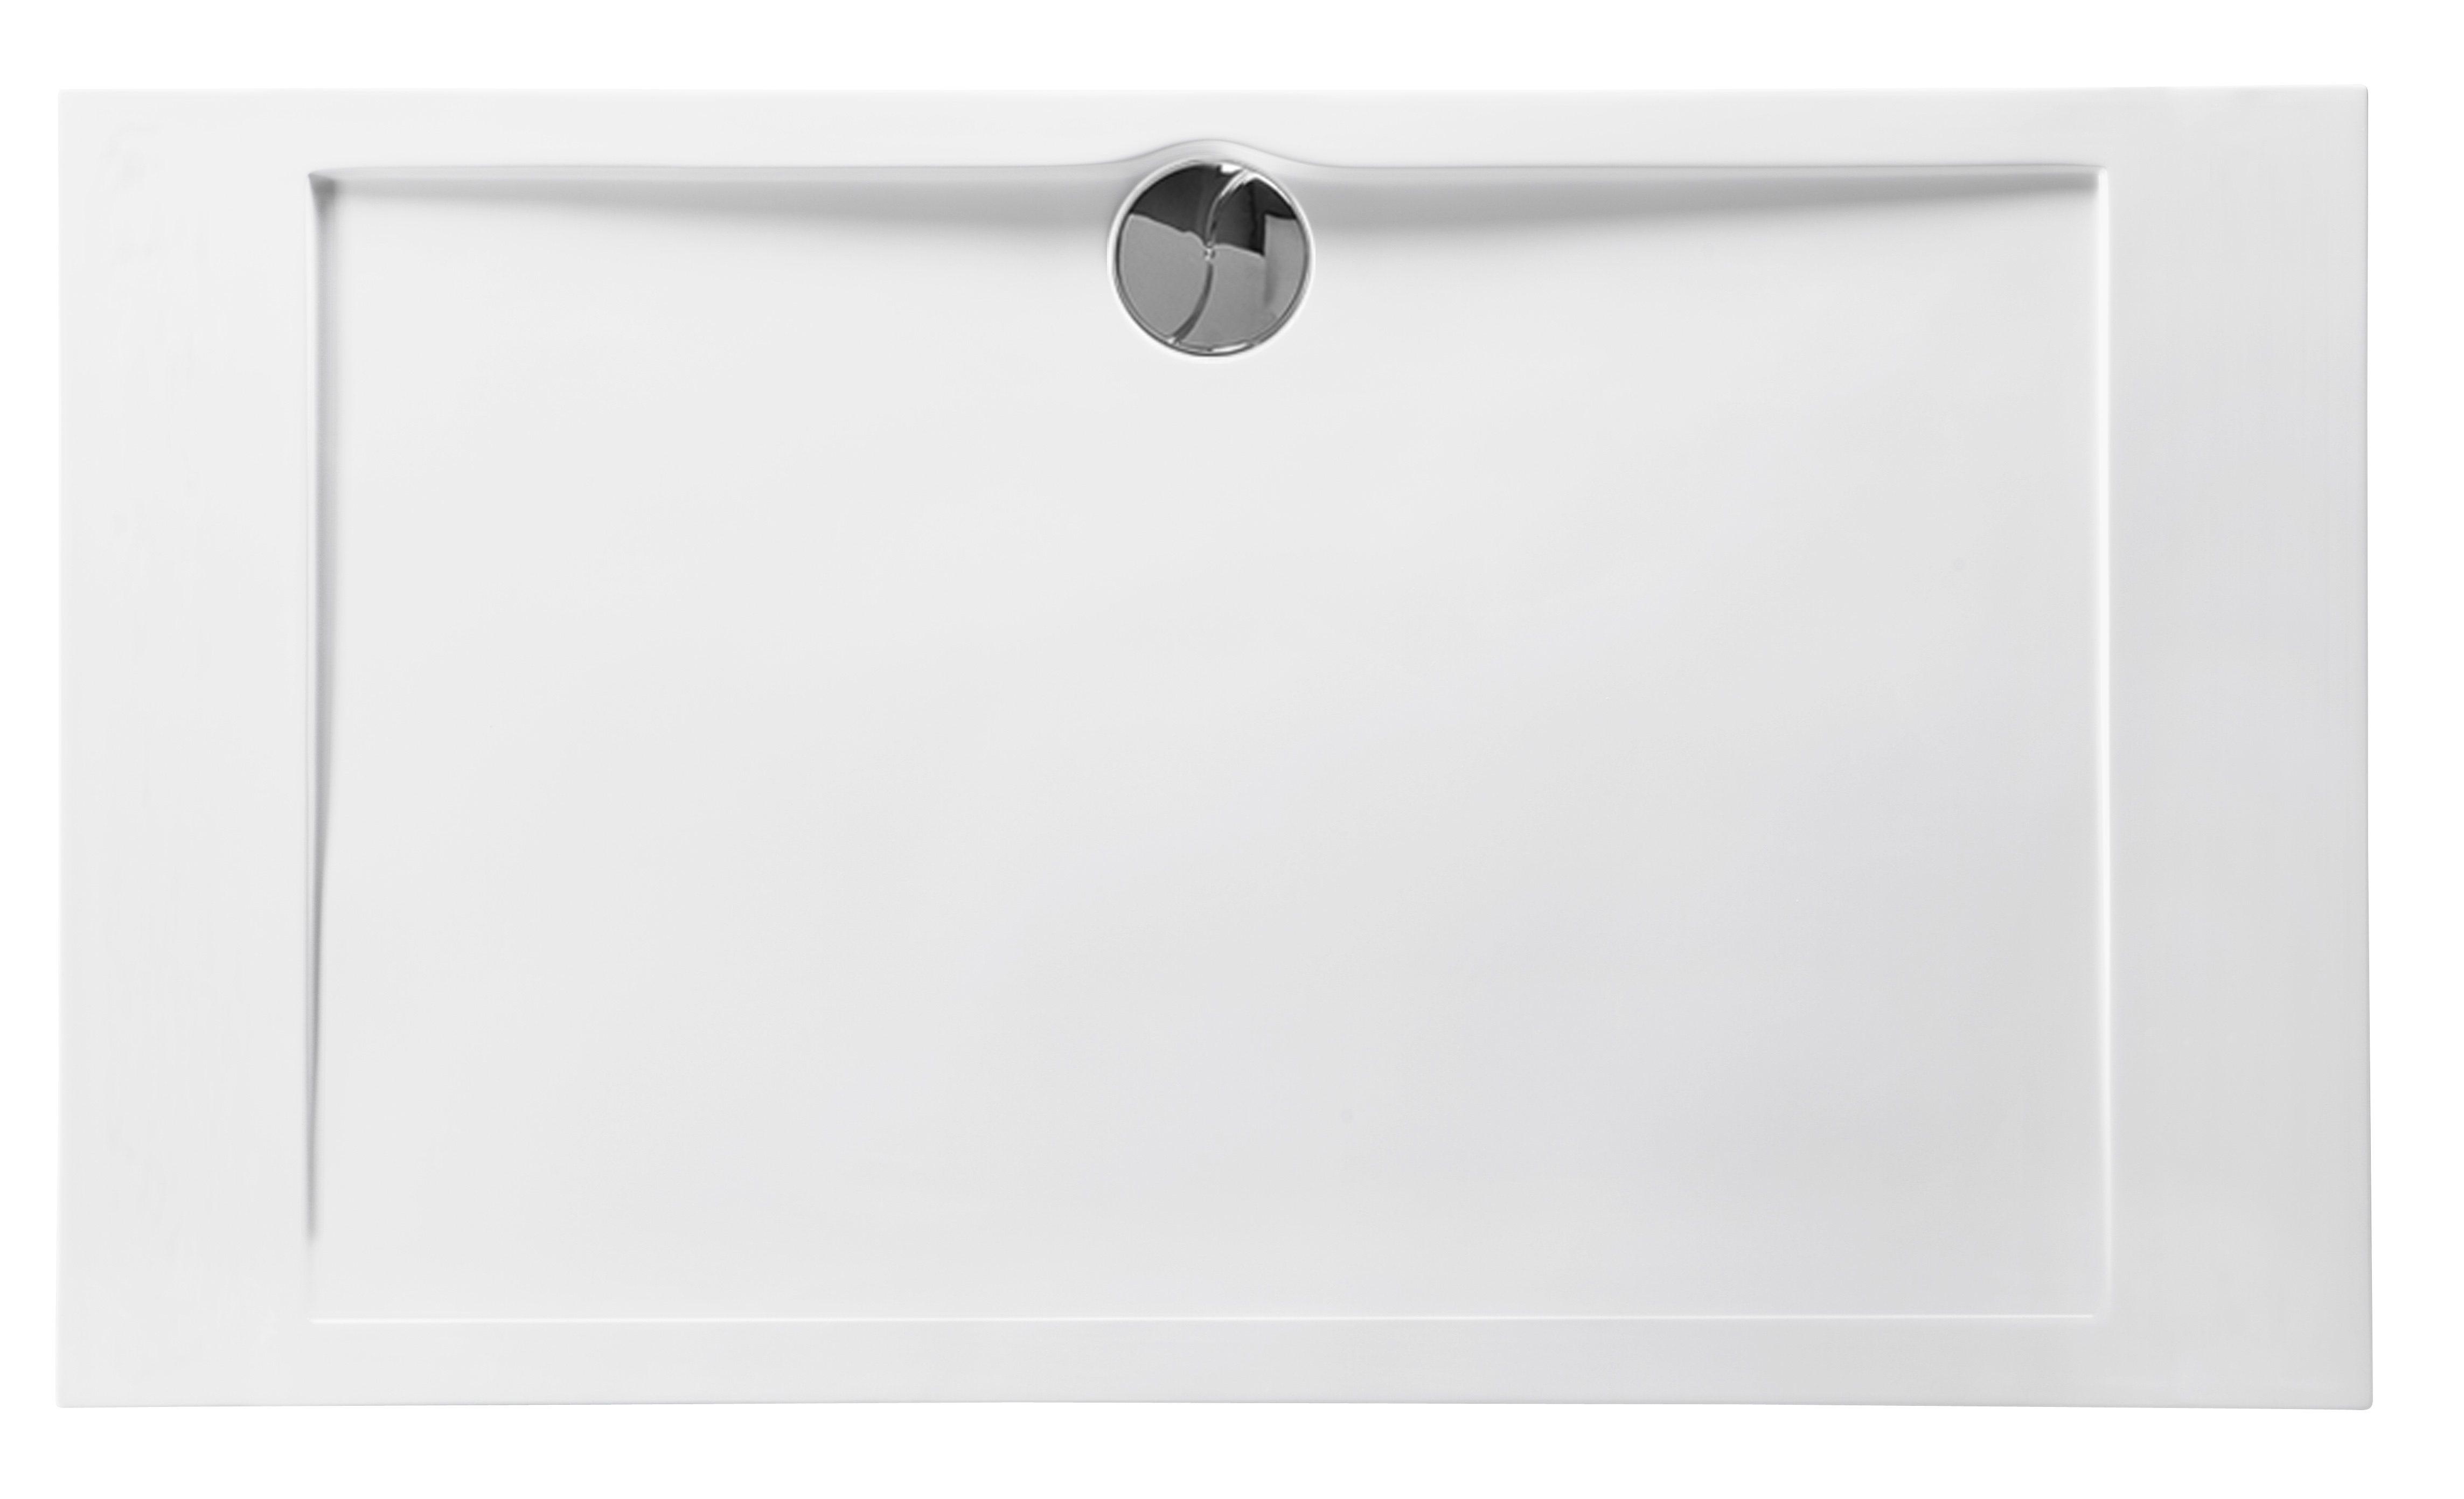 receveur rectangulaire prefixe receveur rectangle aquarine pro. Black Bedroom Furniture Sets. Home Design Ideas